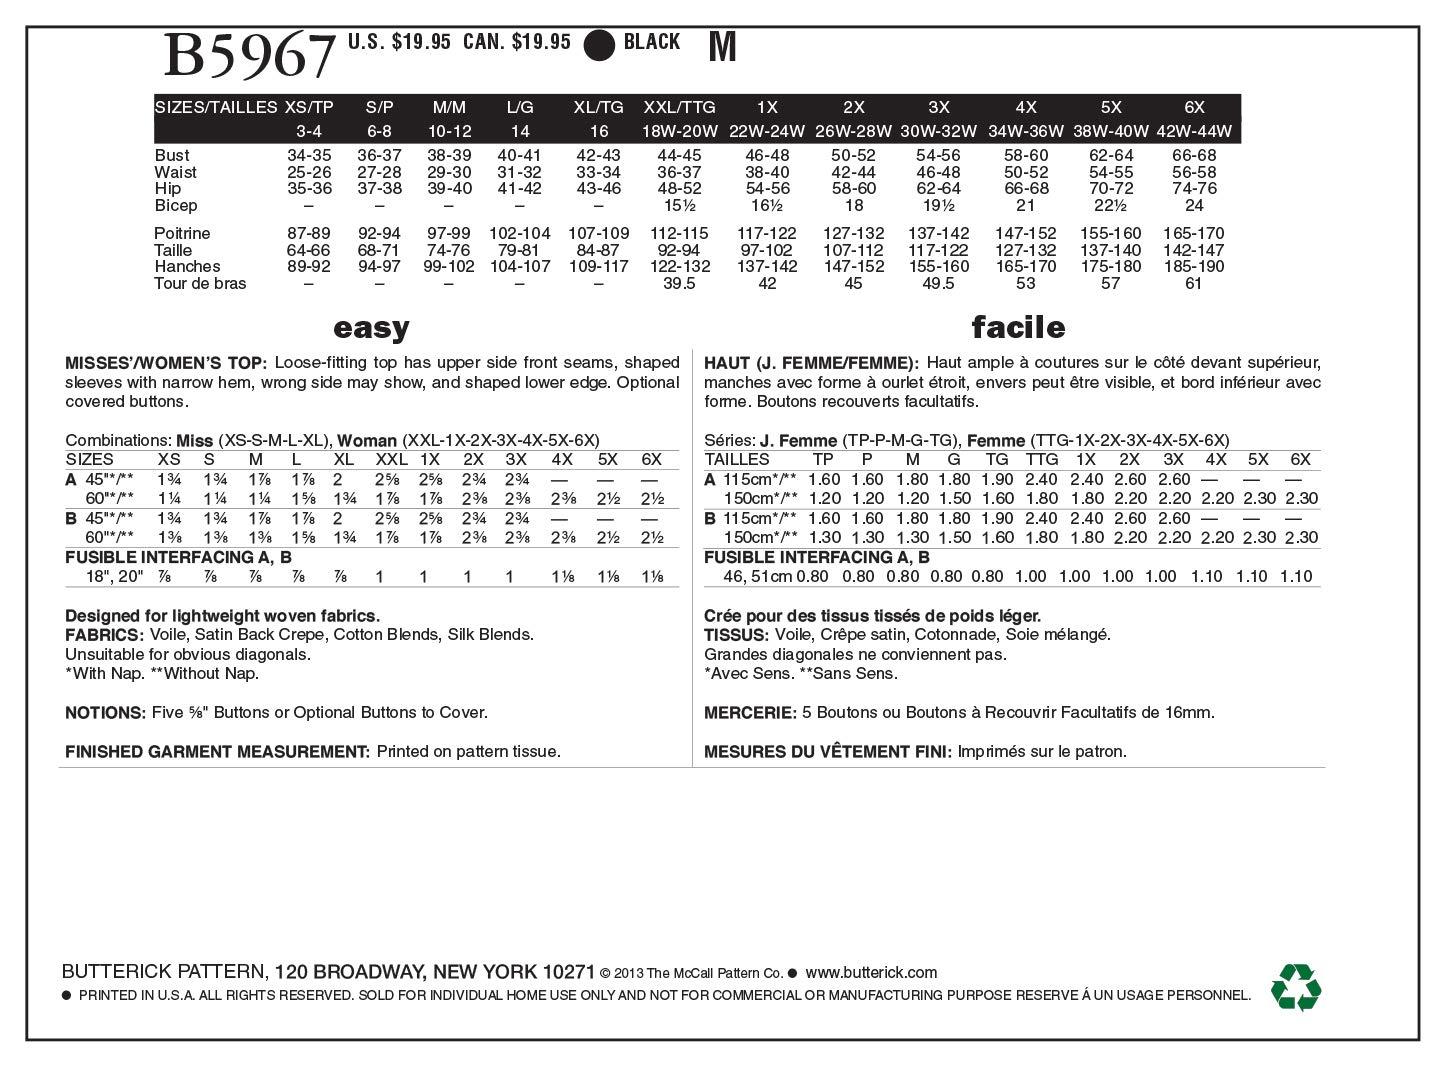 Butterick Patterns B5967 - Patrones de costura de blusas para mujer ...